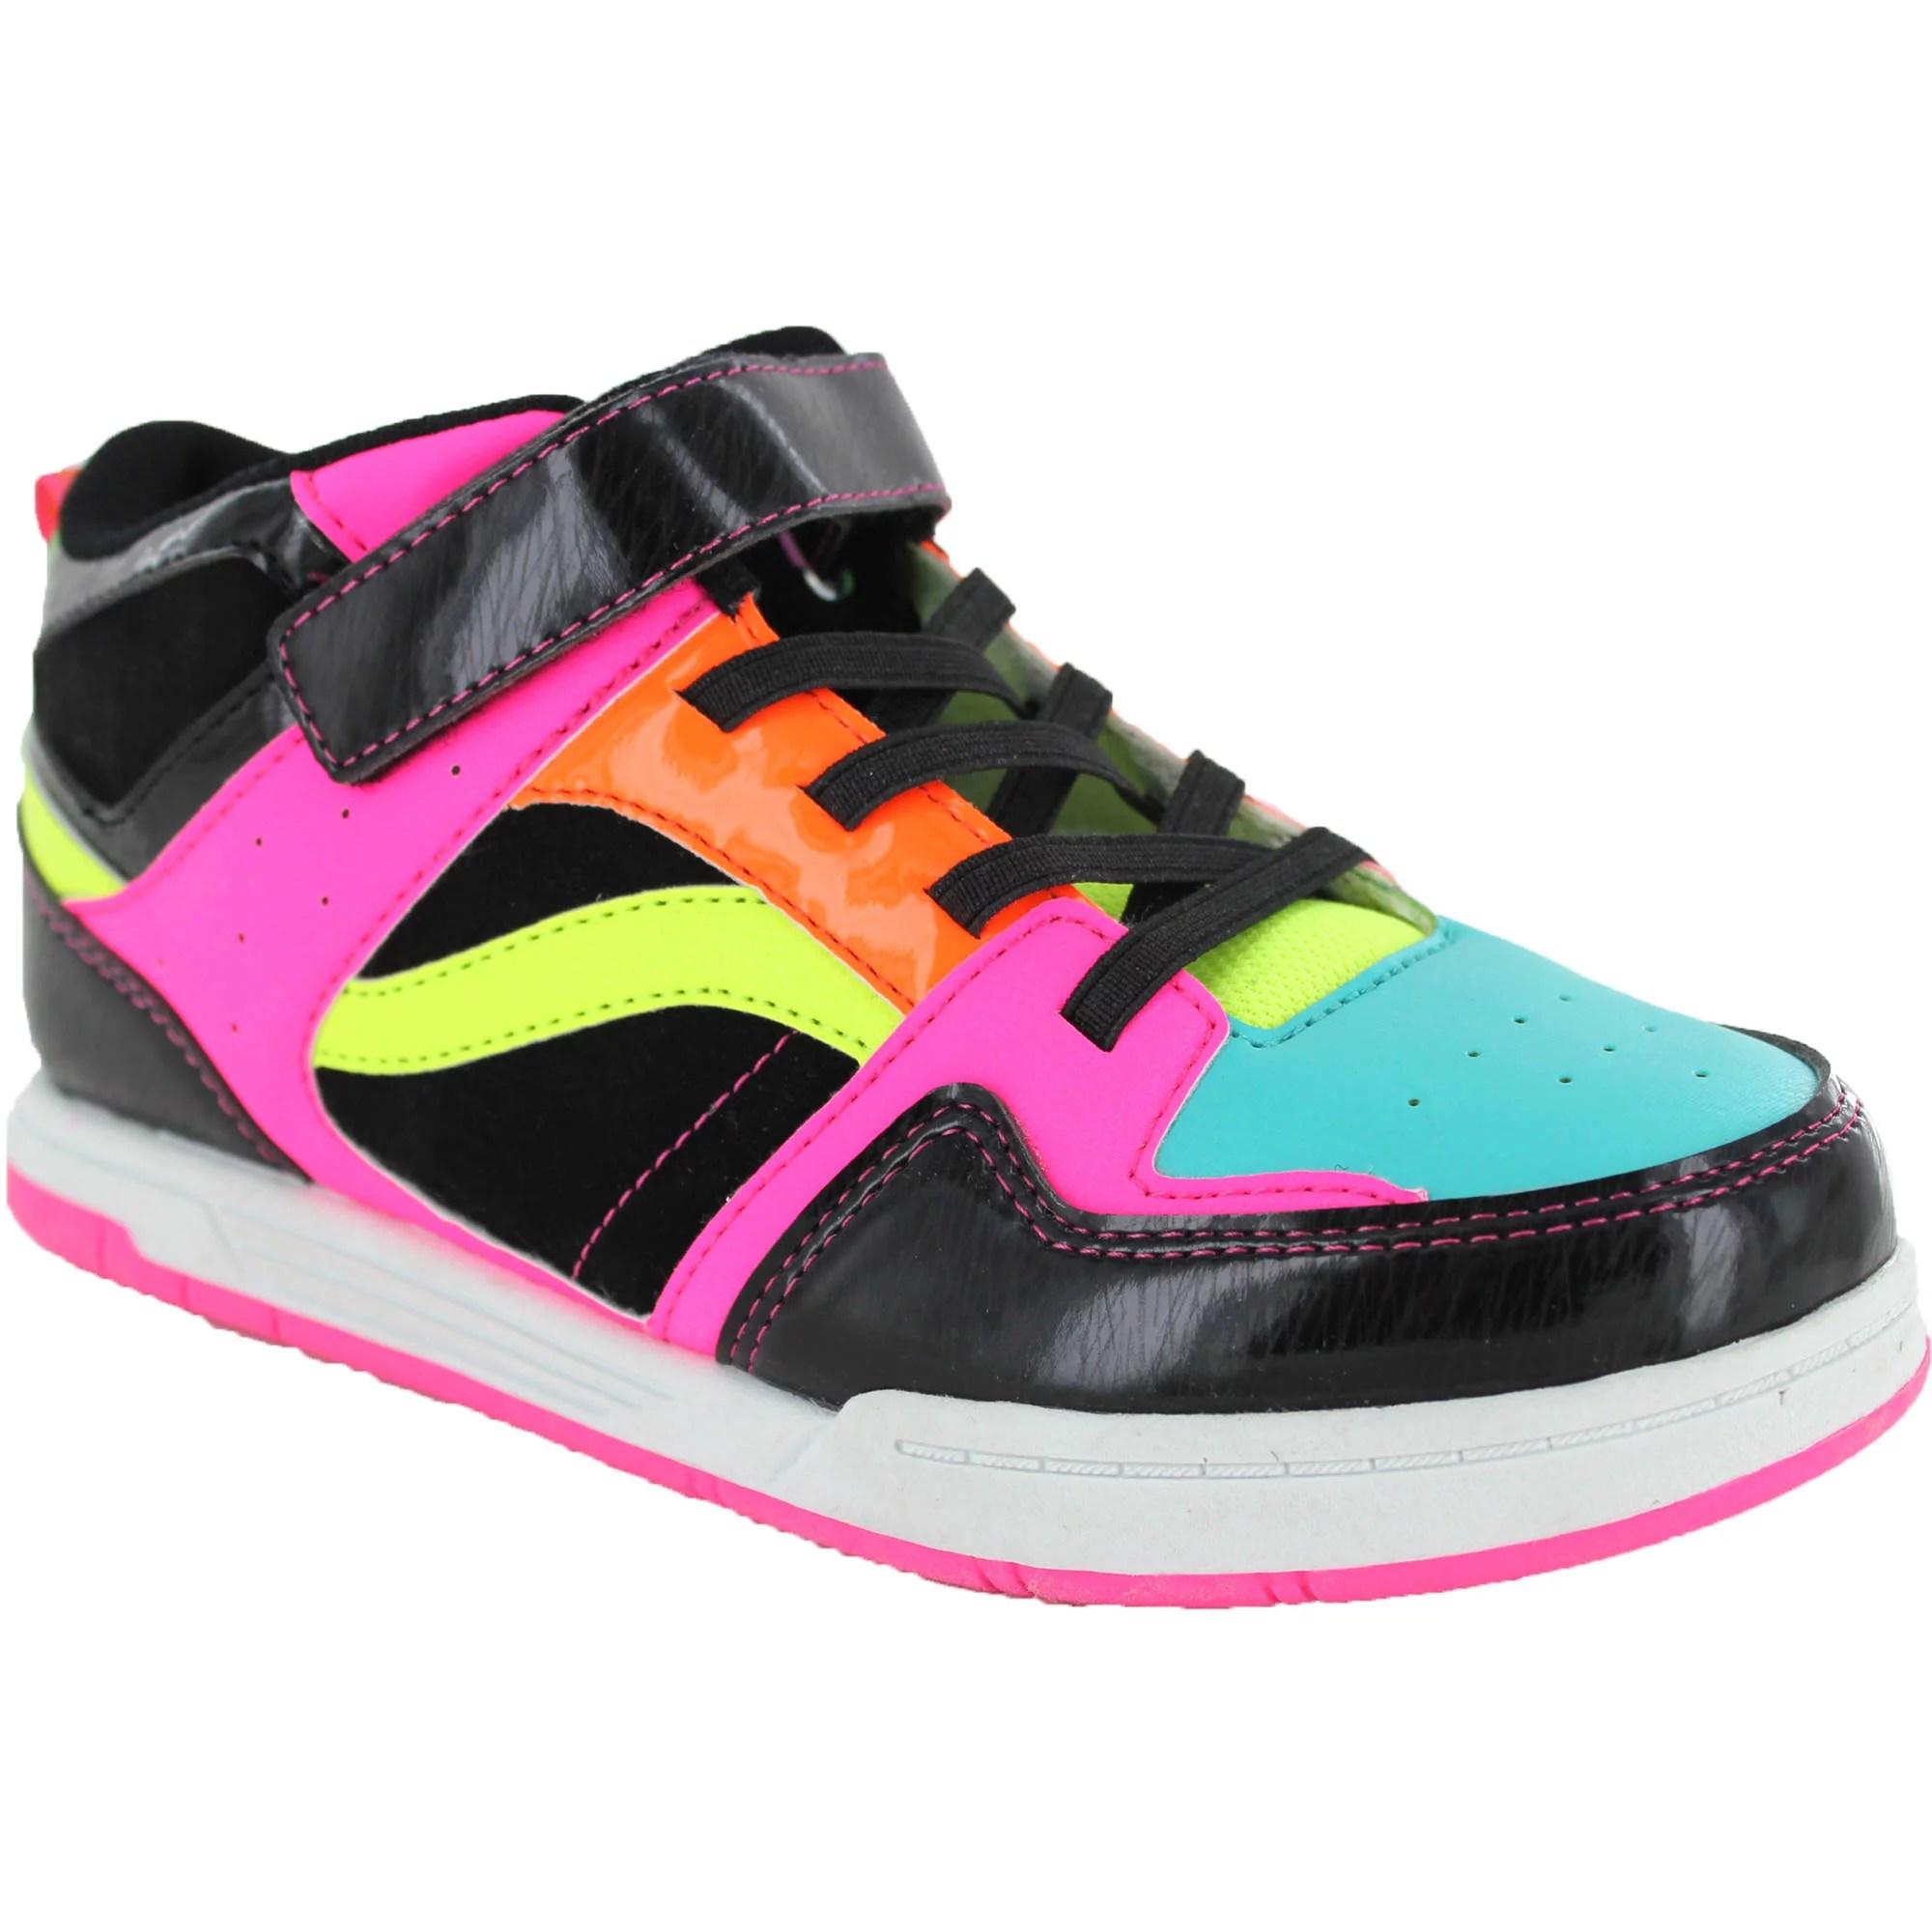 Mens Faded Glory Shoes Walmart